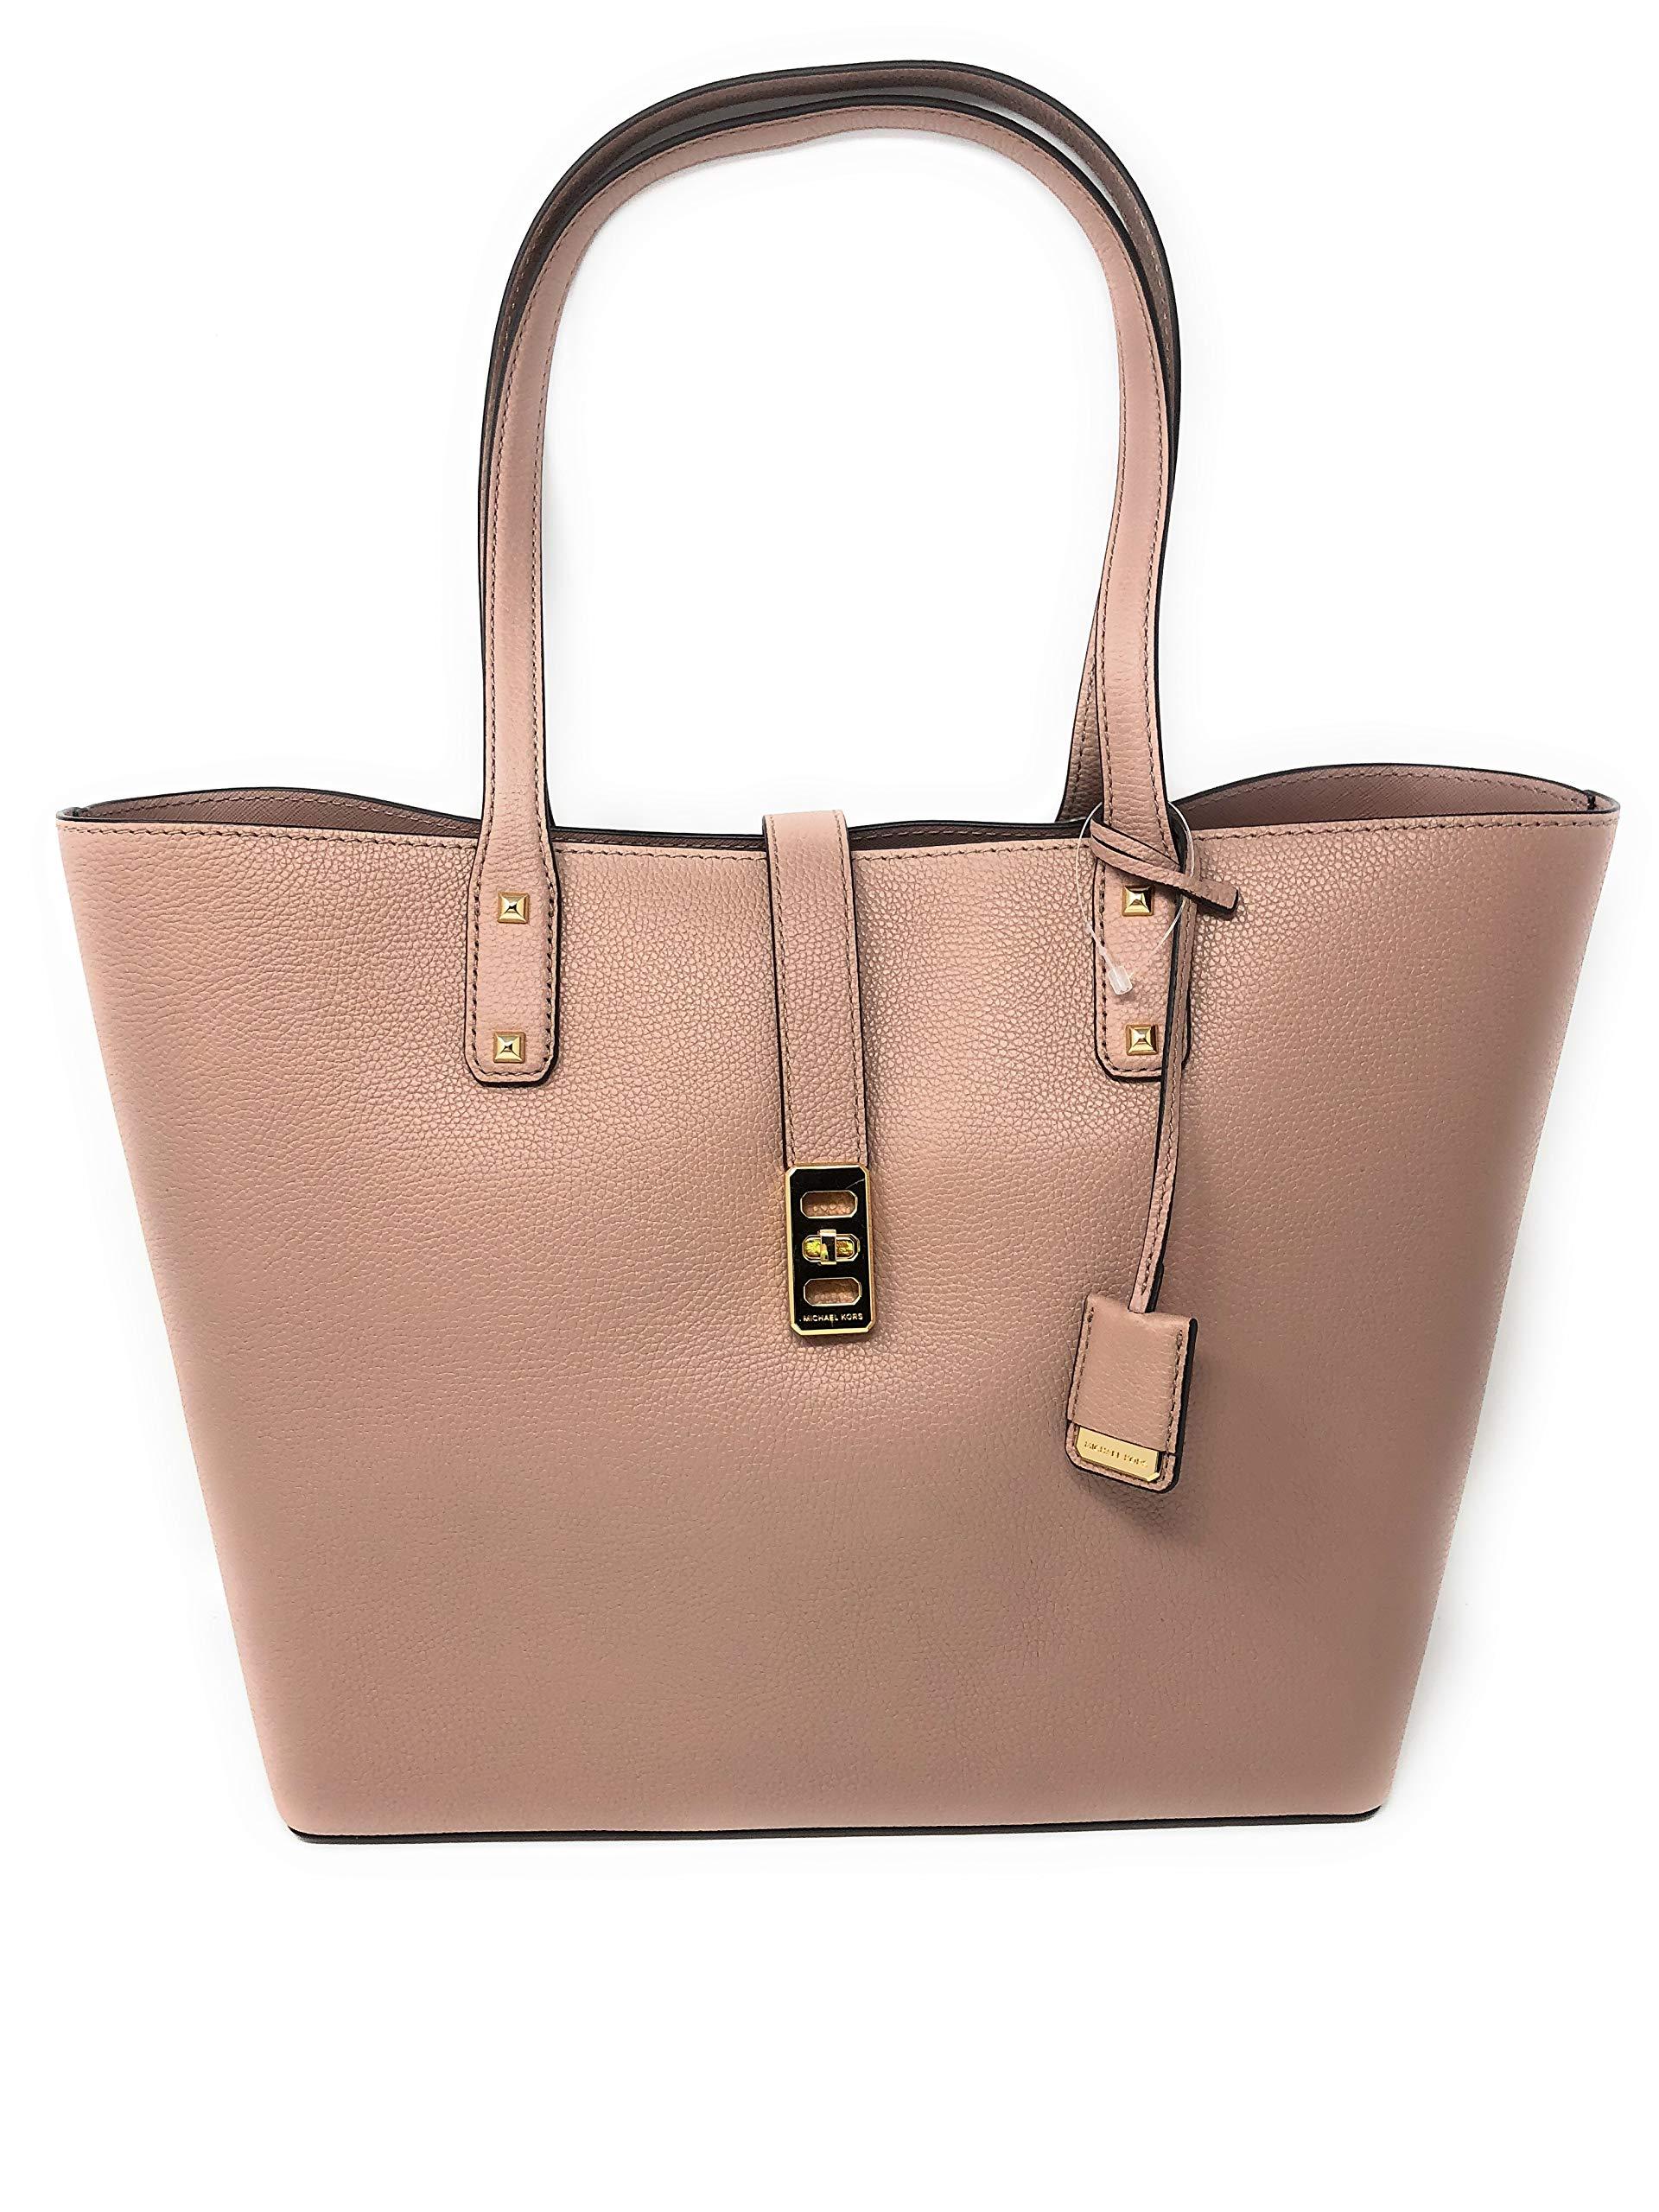 Michael Kors Karson Large Carryall Leather Tote Bag (Fawn)